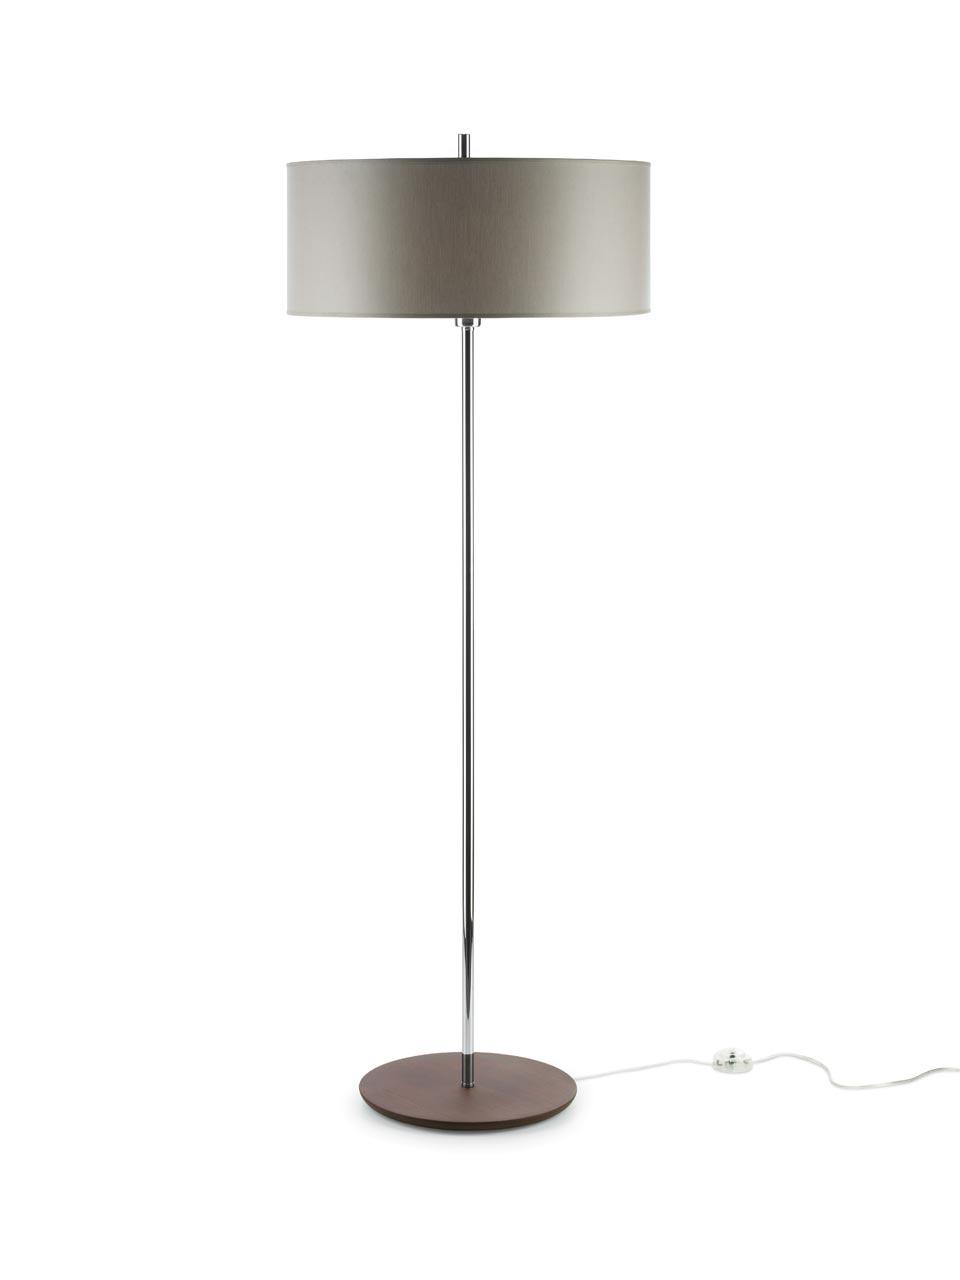 Ovni Chocolate grand lampadaire. Paulo Coelho.